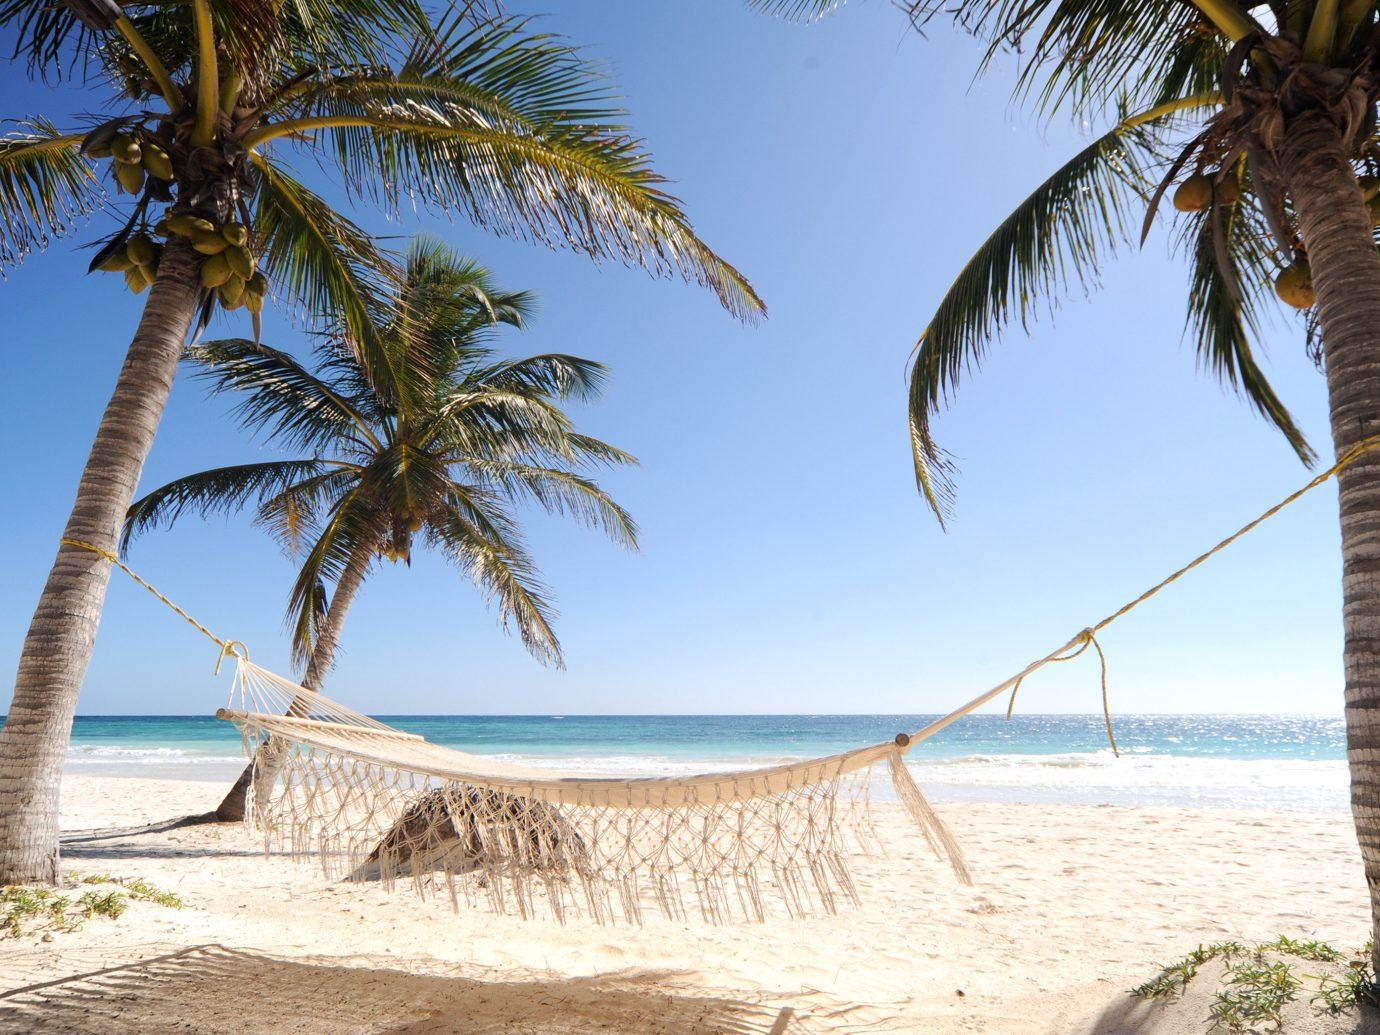 Beach Beachfront Luxury Ocean Trip Ideas Tropical tree sky outdoor palm water plant body of water caribbean vacation Sea palm family shore arecales tropics Coast bay sand cape walkway sandy shade